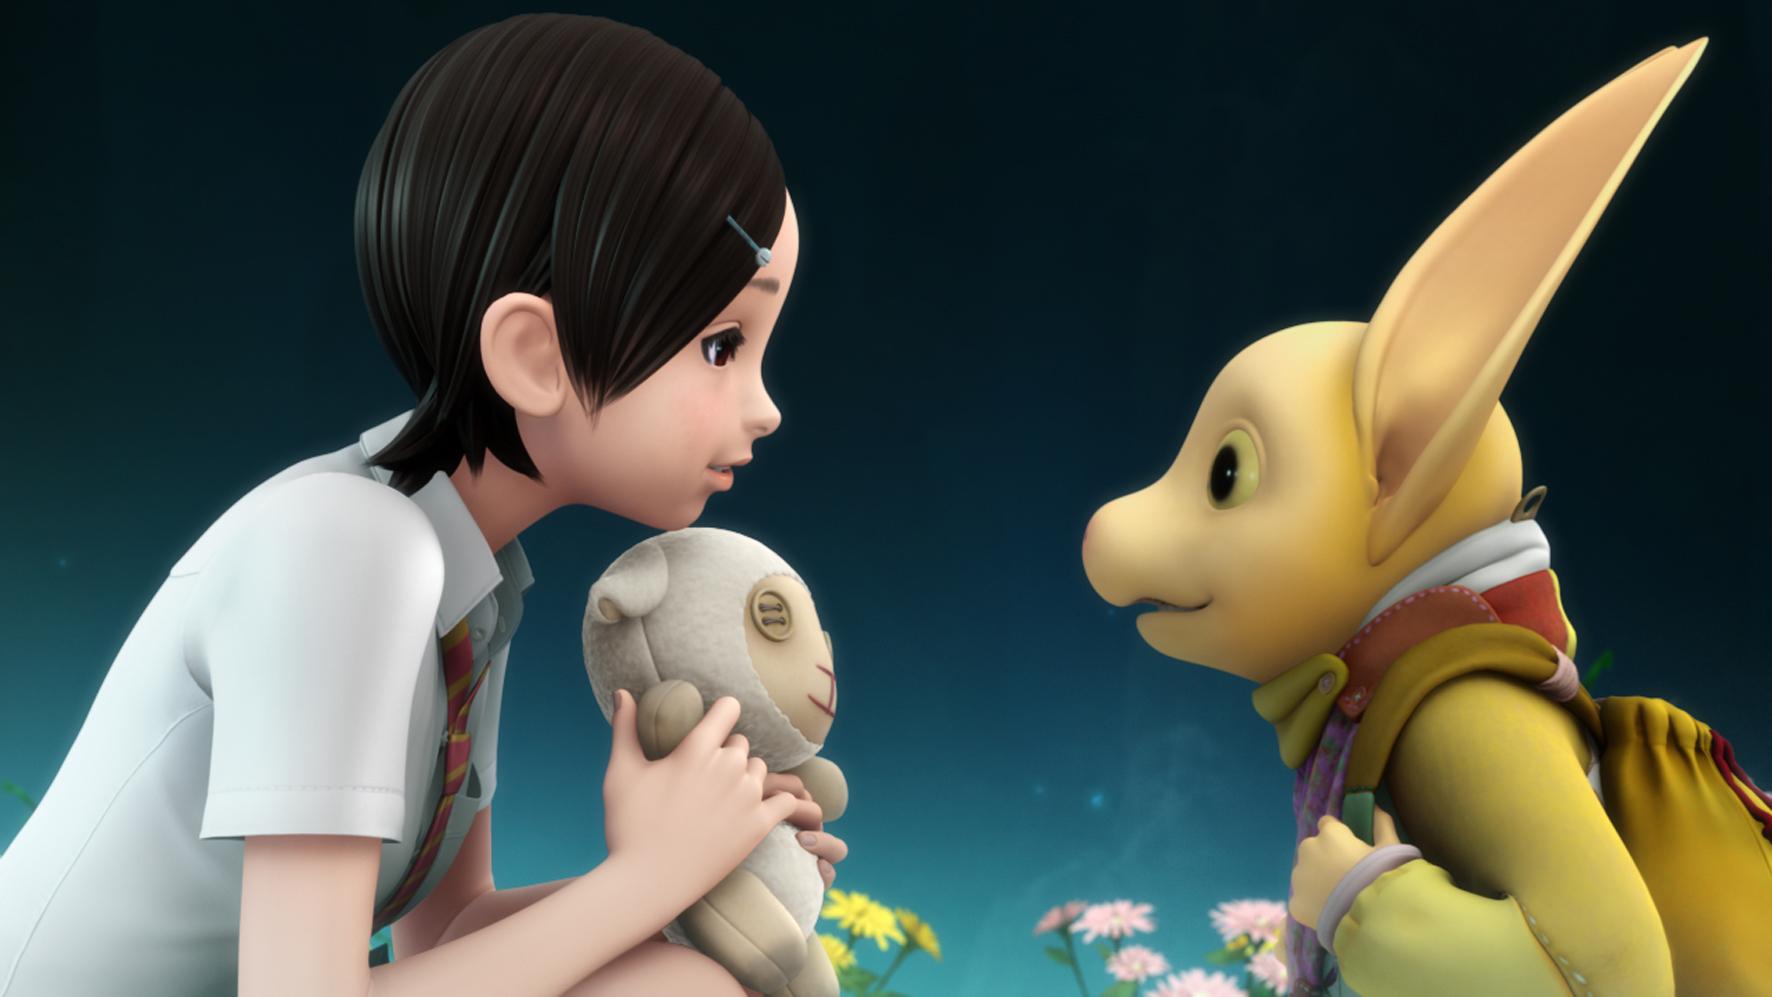 Animax-Programm-Highlights im Mai: Production I.G Hommage - AnimaniA